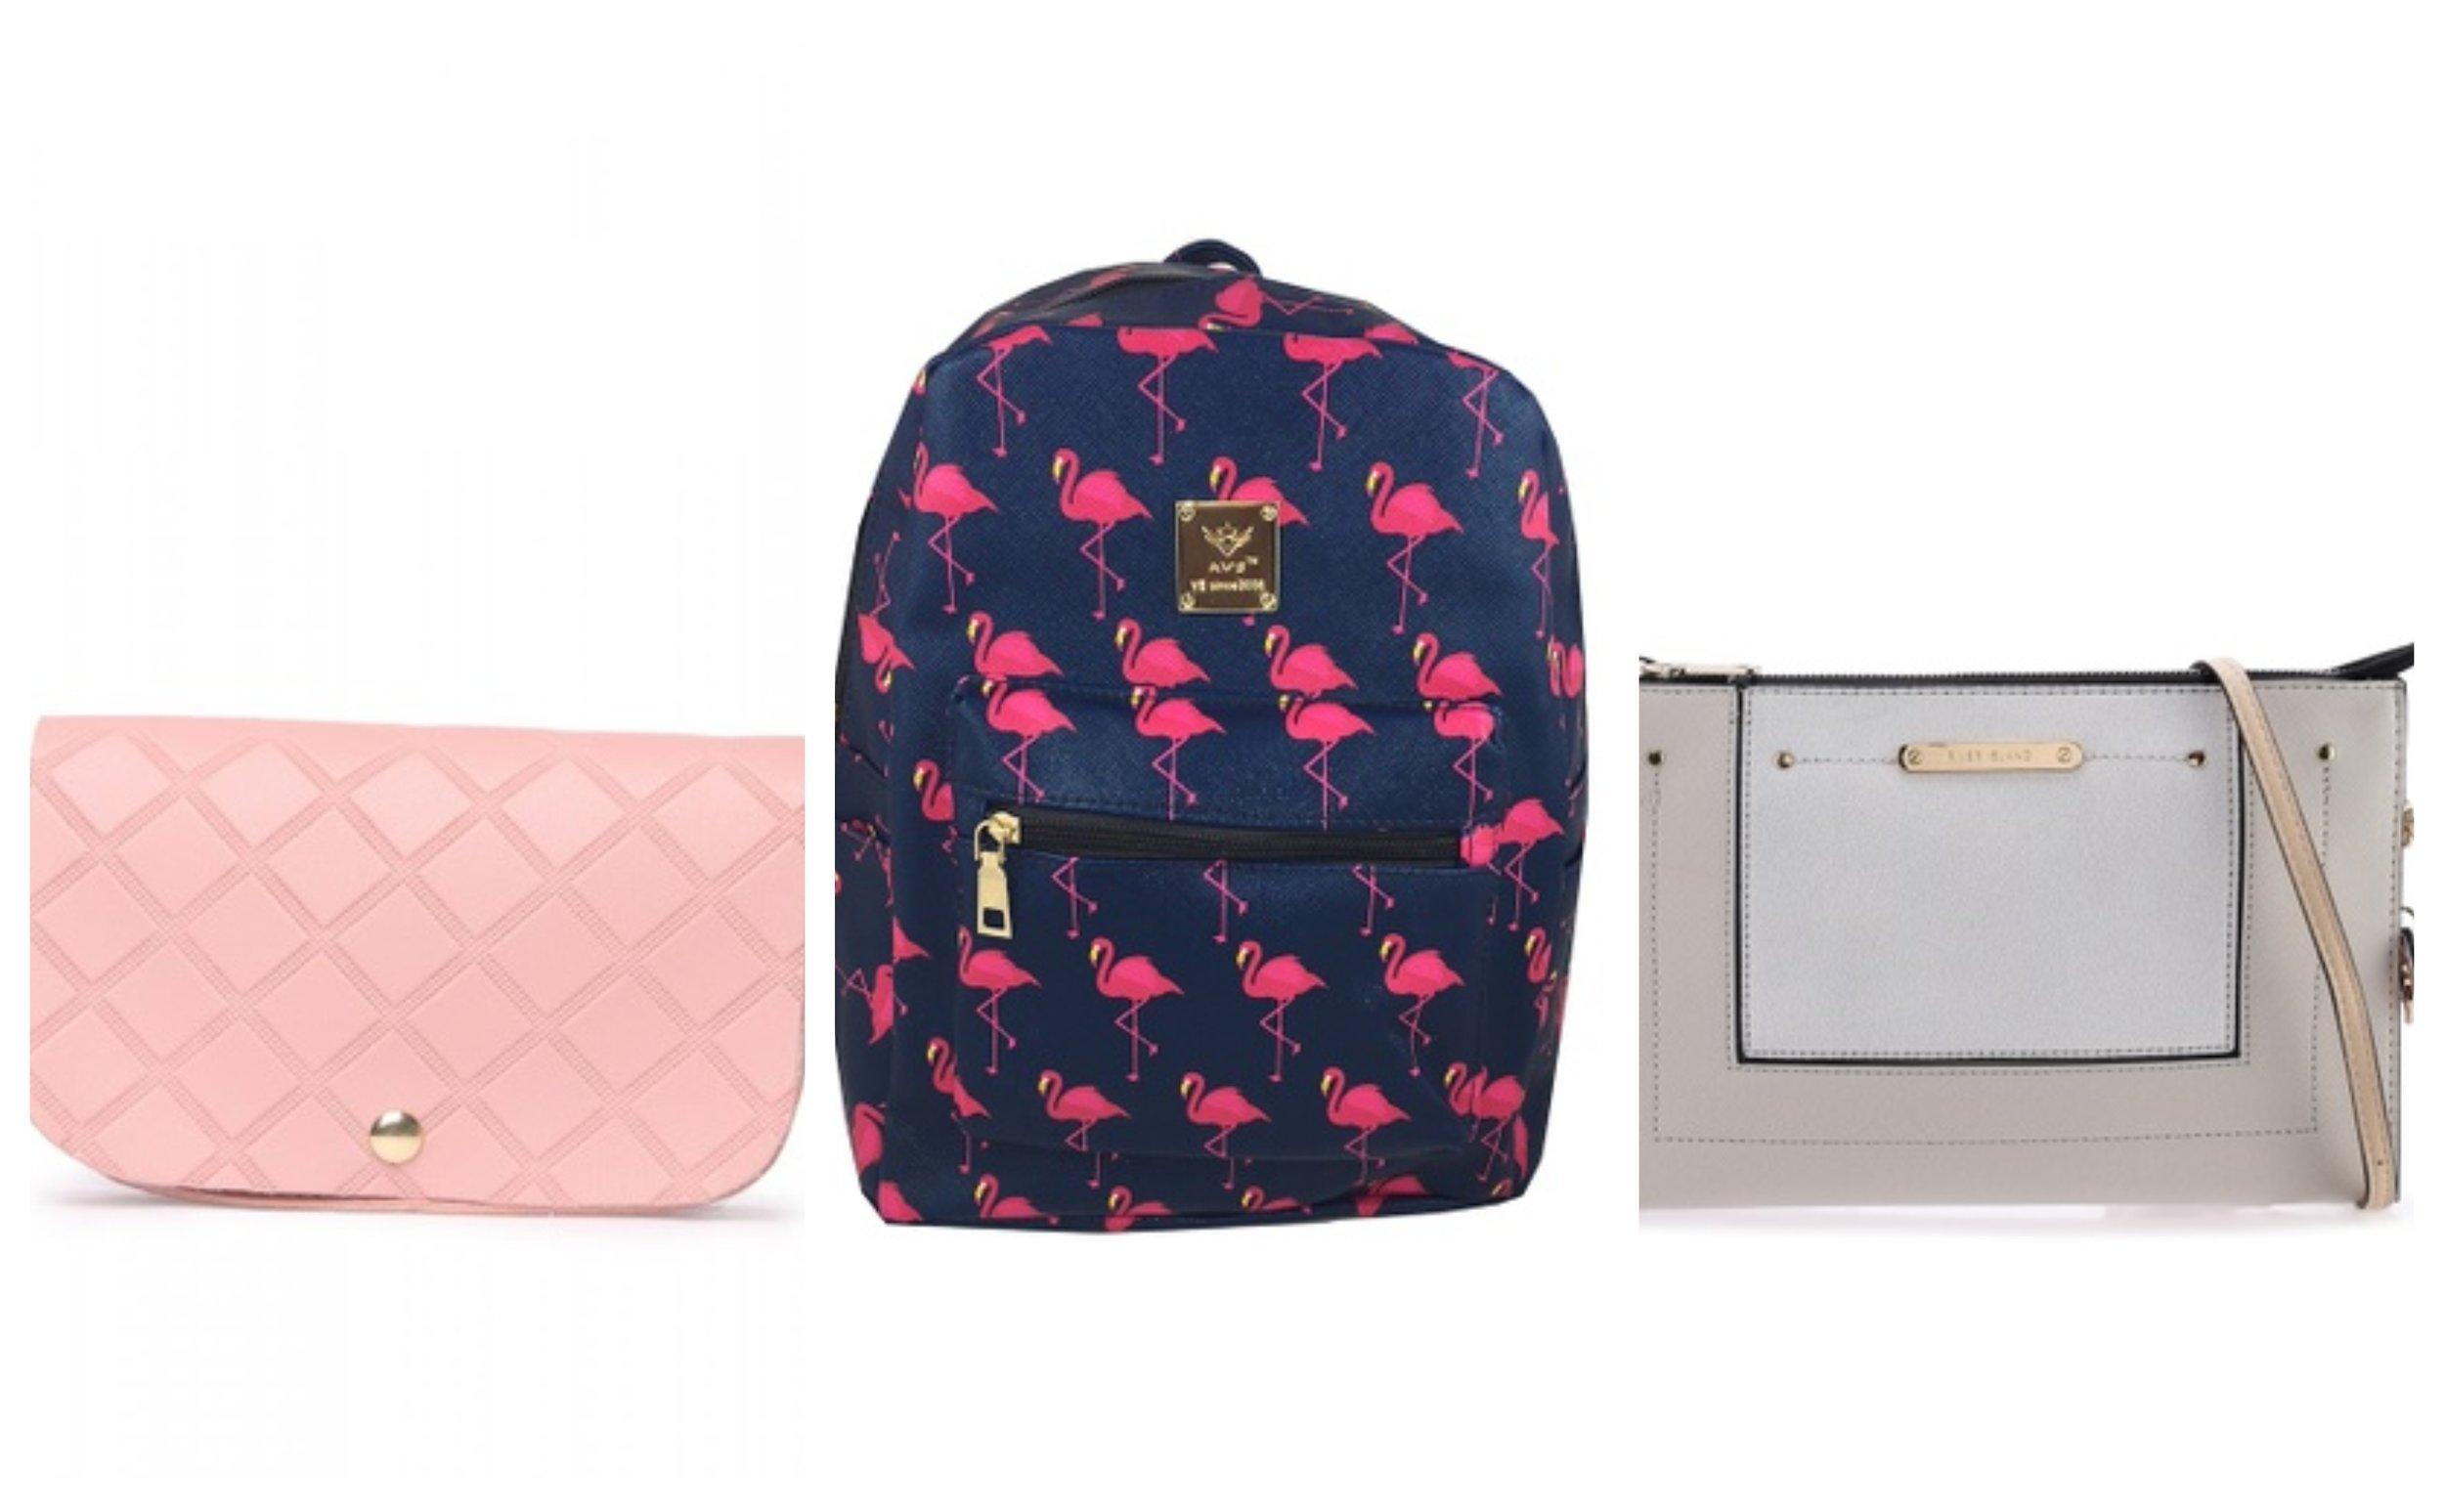 AR by Alfio Raldo Diamond Checkered Sling Bag; TCWK Women Blue Backpack; River Island Crossbody Pochette